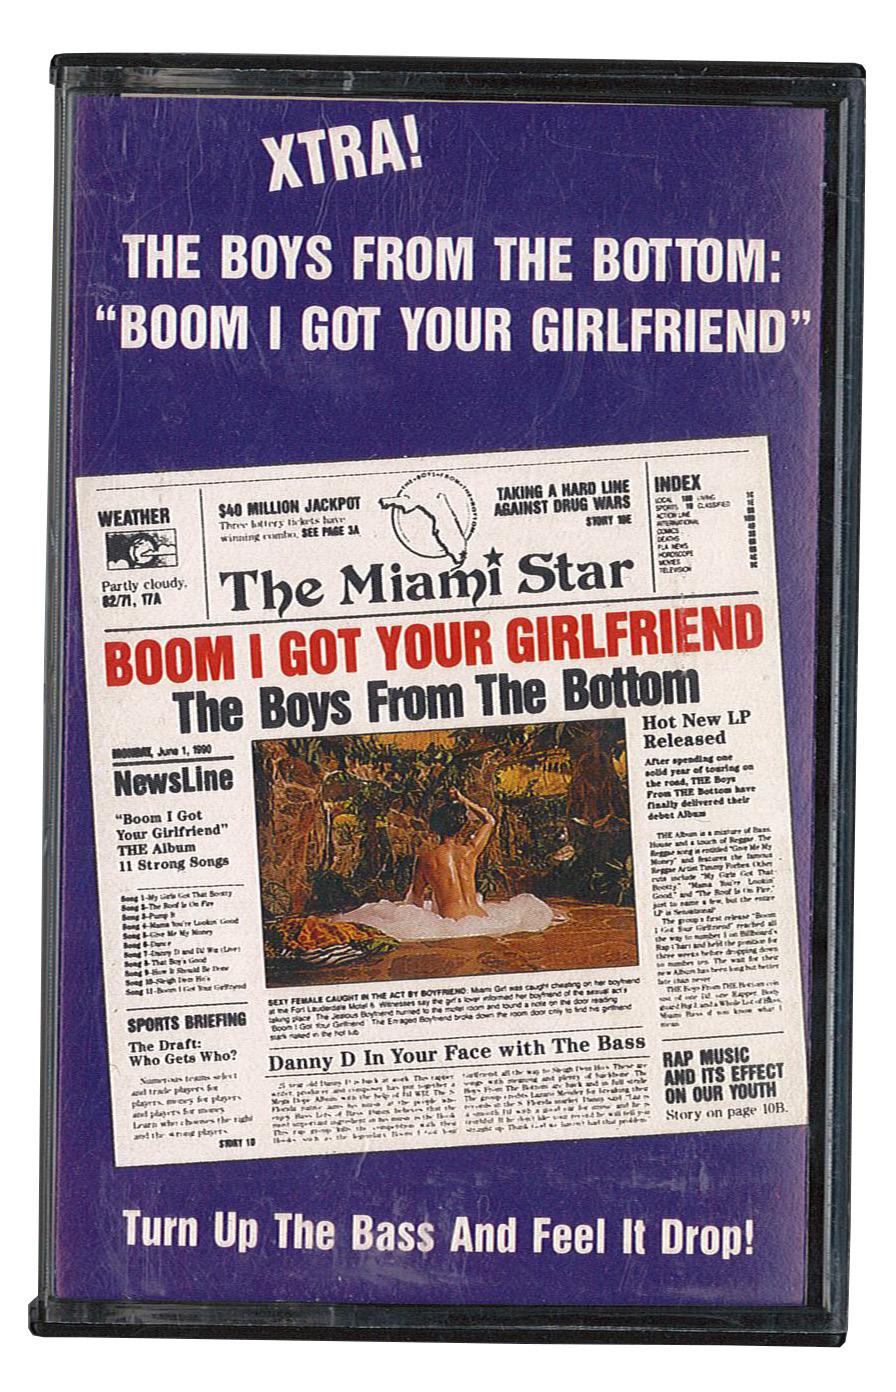 WLWLTDOO-1990-CS-BOYS_FROM_THE_BOTTOM-FRONT-HTCT3326.jpg